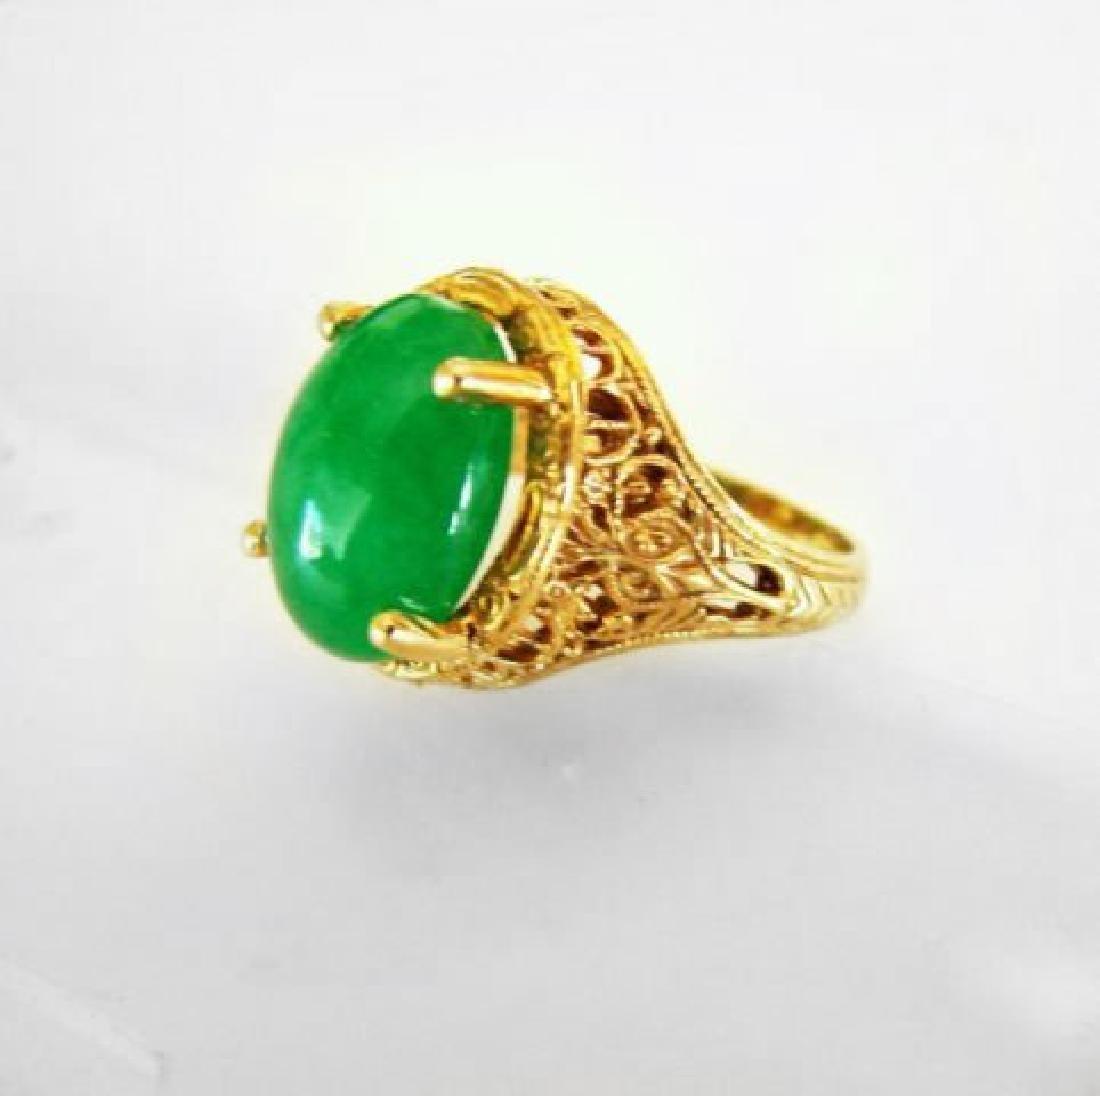 Antique Ring Jadeite Jade 6.82 Carat 14k Yellow Gold